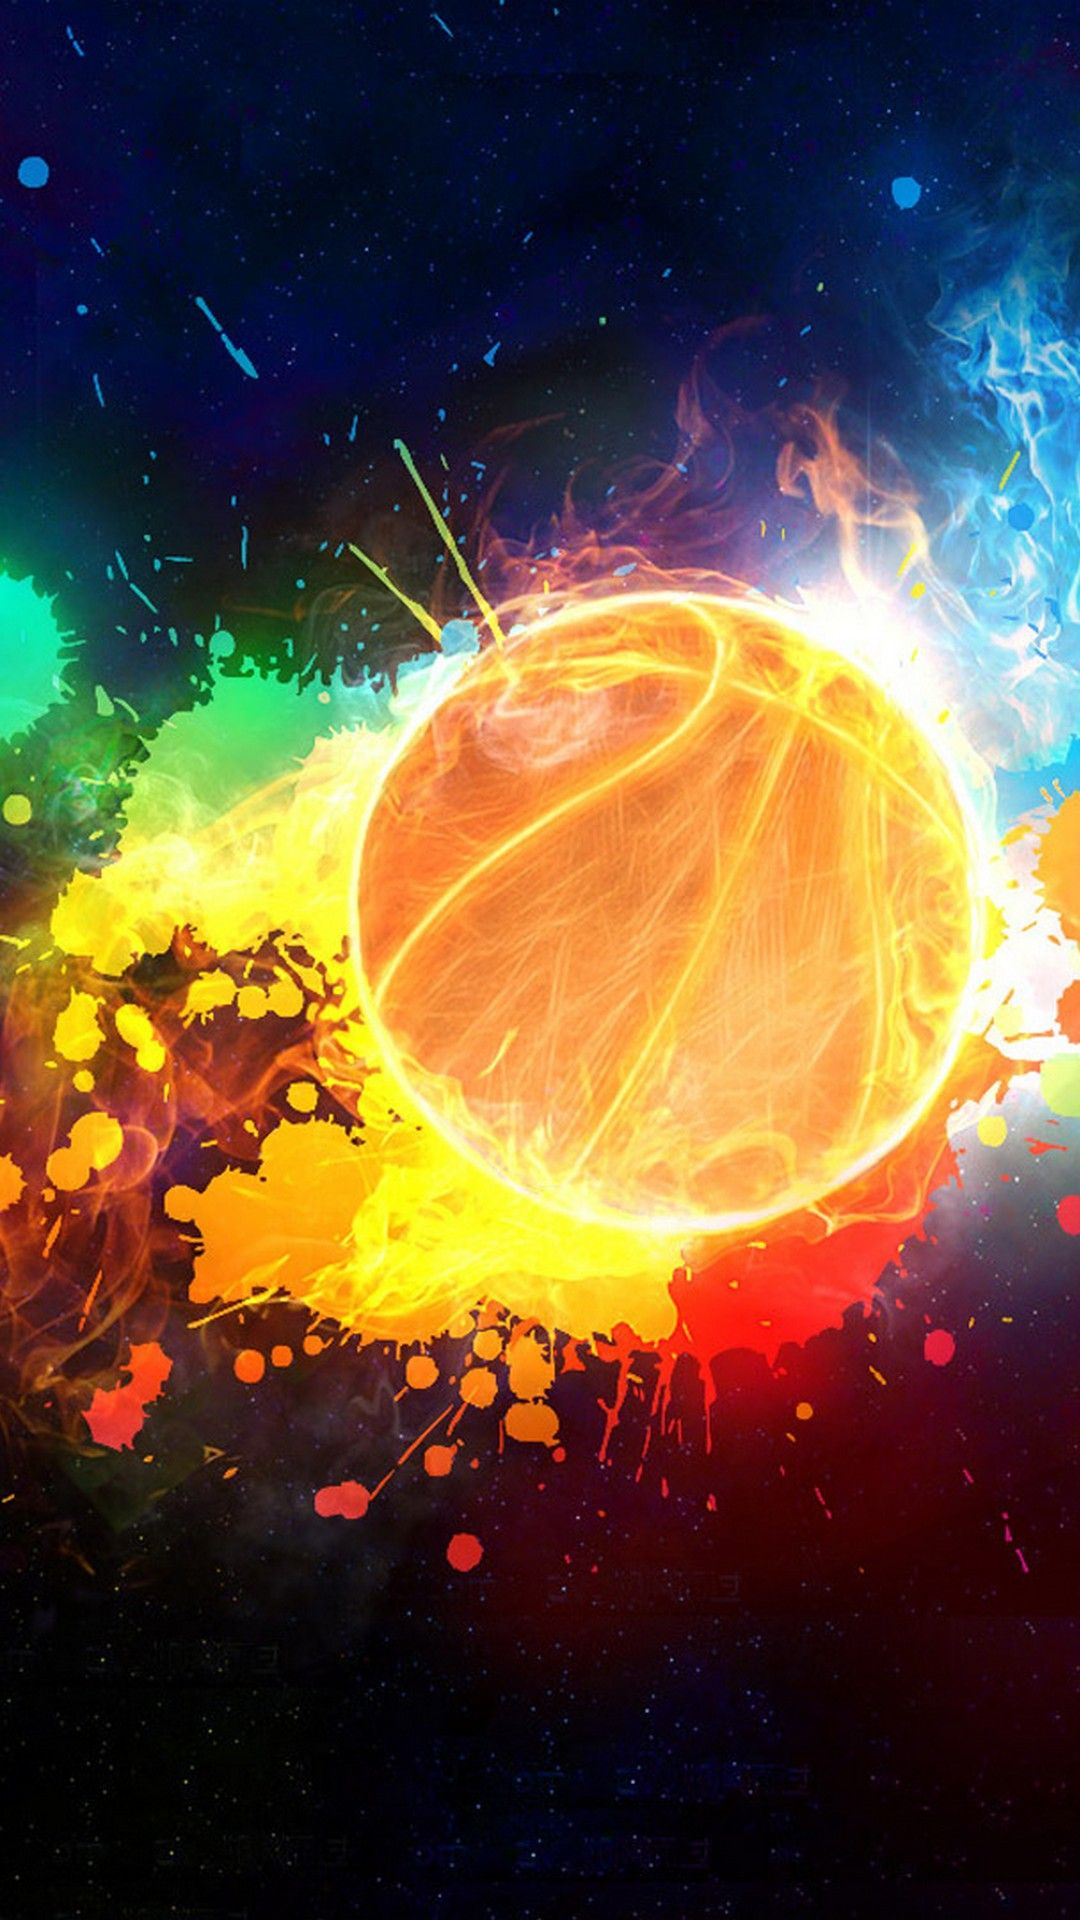 Basketball Games Iphone 6 Wallpaper Cool Basketball Wallpapers Basketball Wallpapers Hd Basketball Live Wallpaper